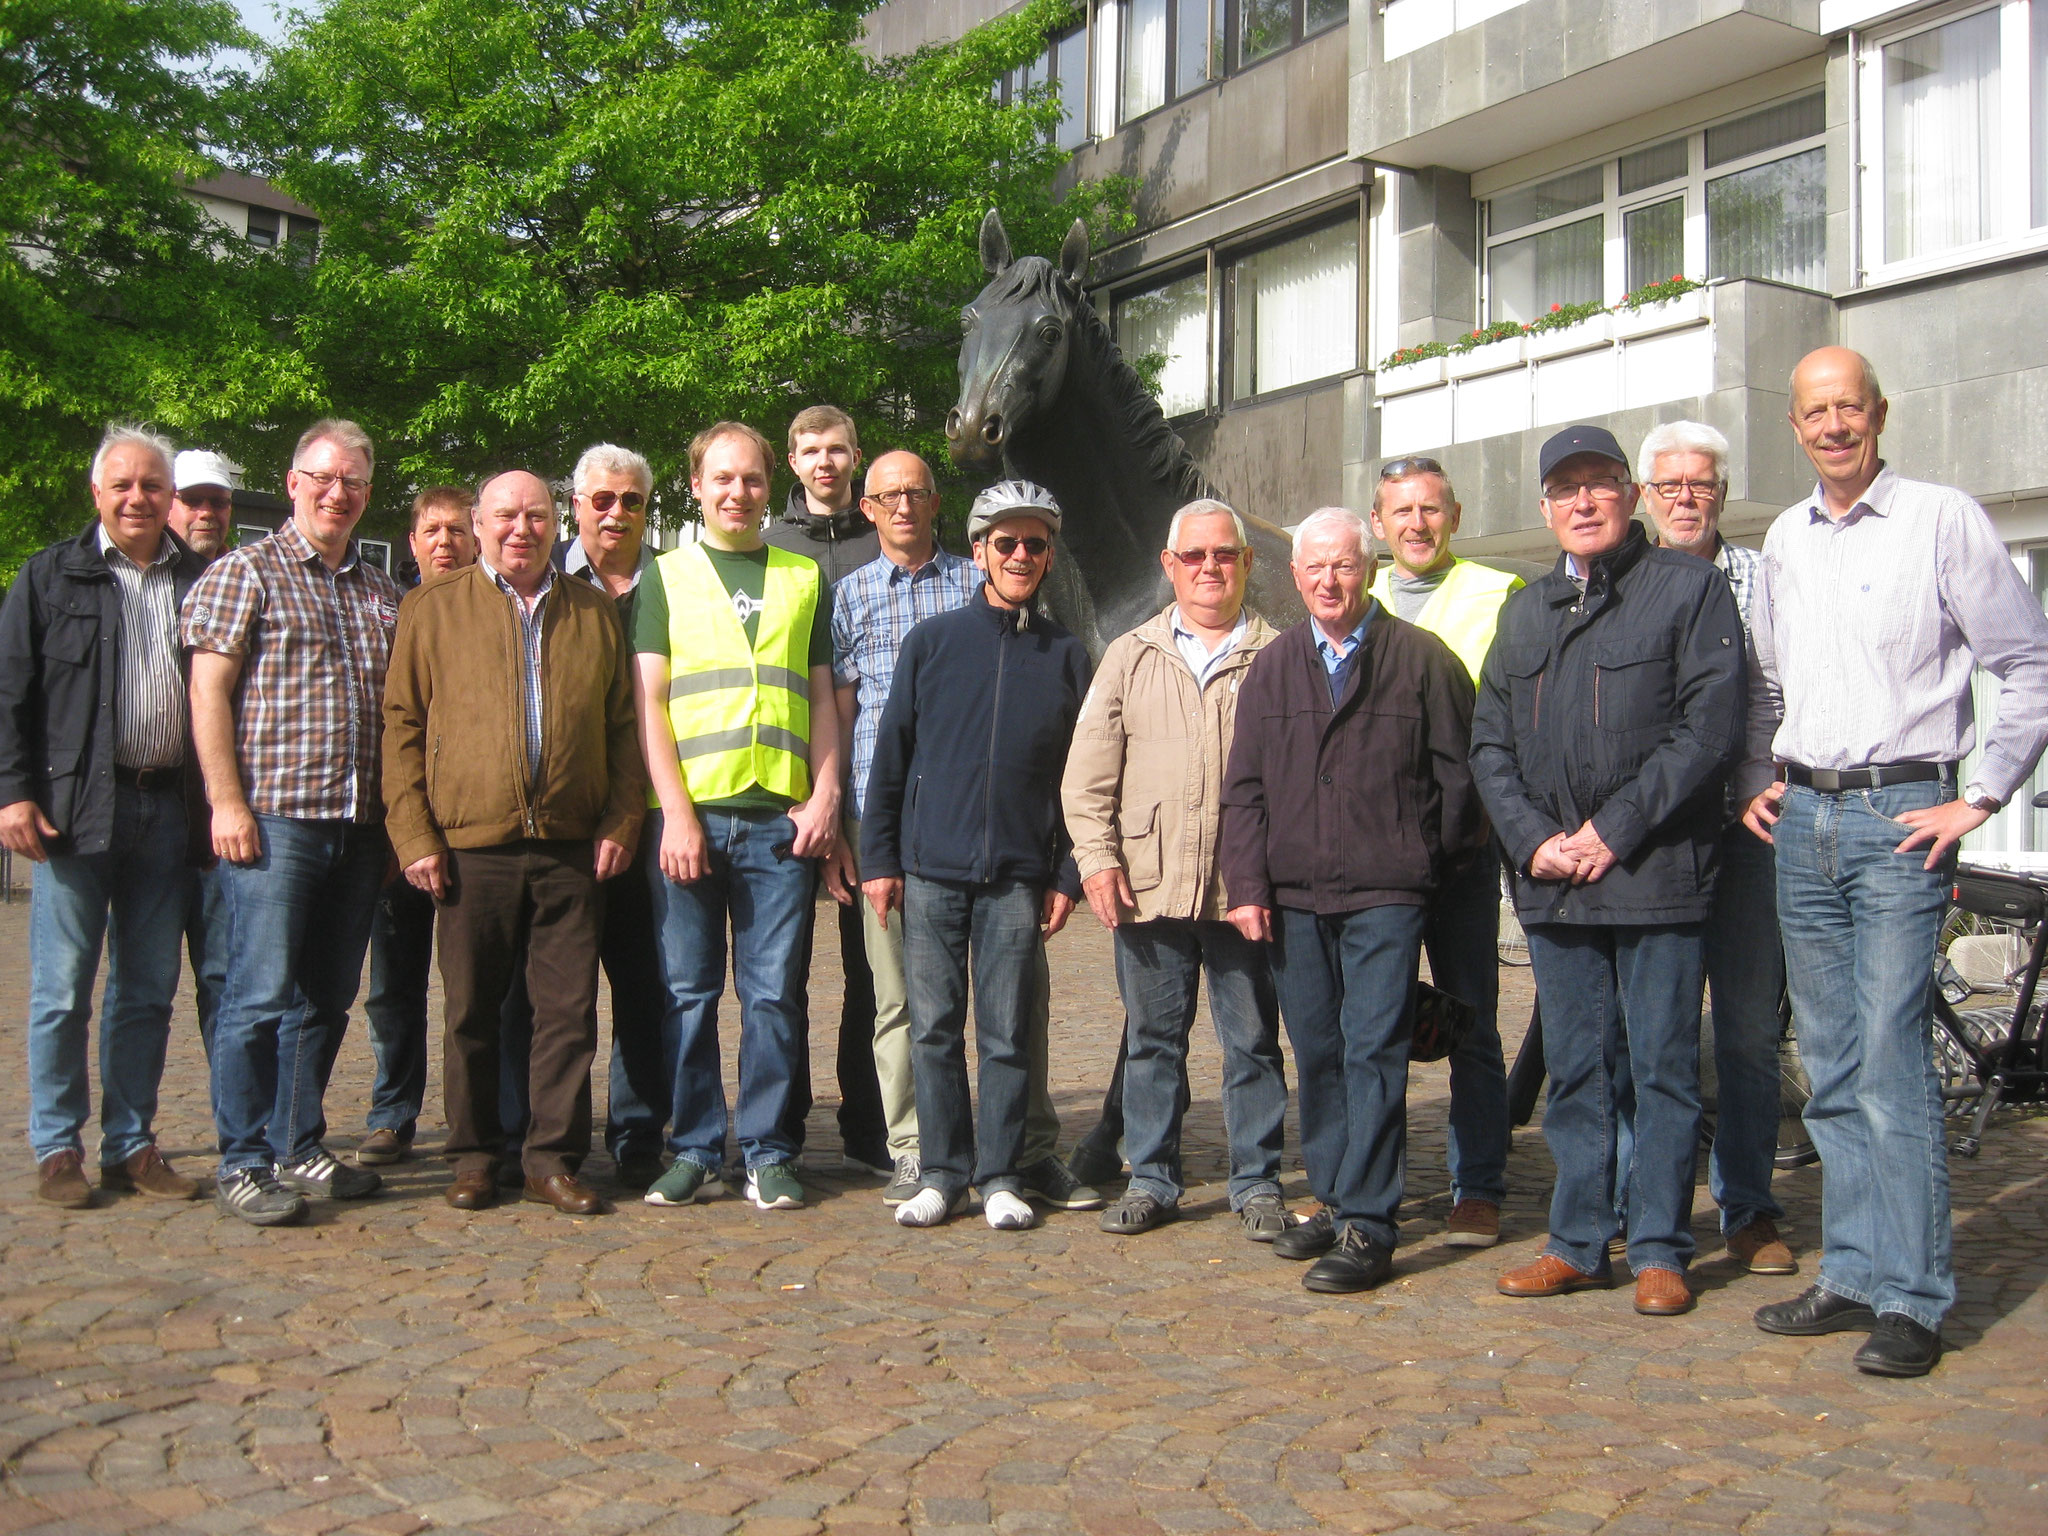 Fahrradtour Männersportgruppe 2016 nach Bünne